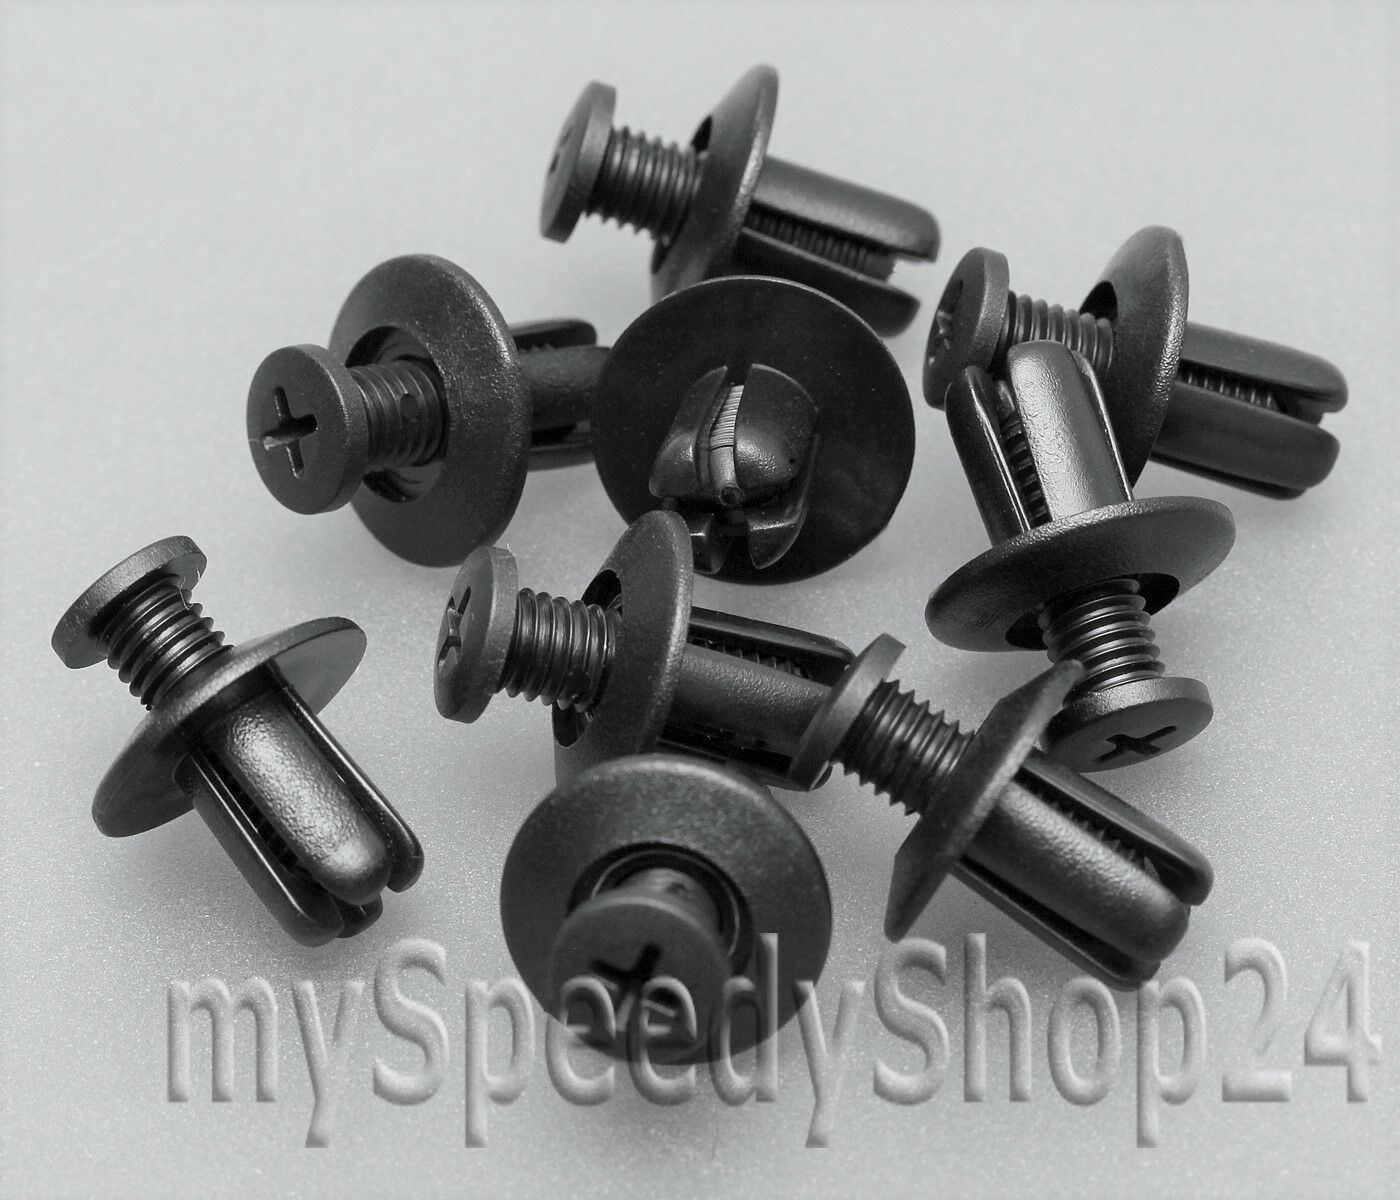 20 x Spreiznieten Clips Stoßstange Radlauf Hyundai Accent I B092-51-833 II